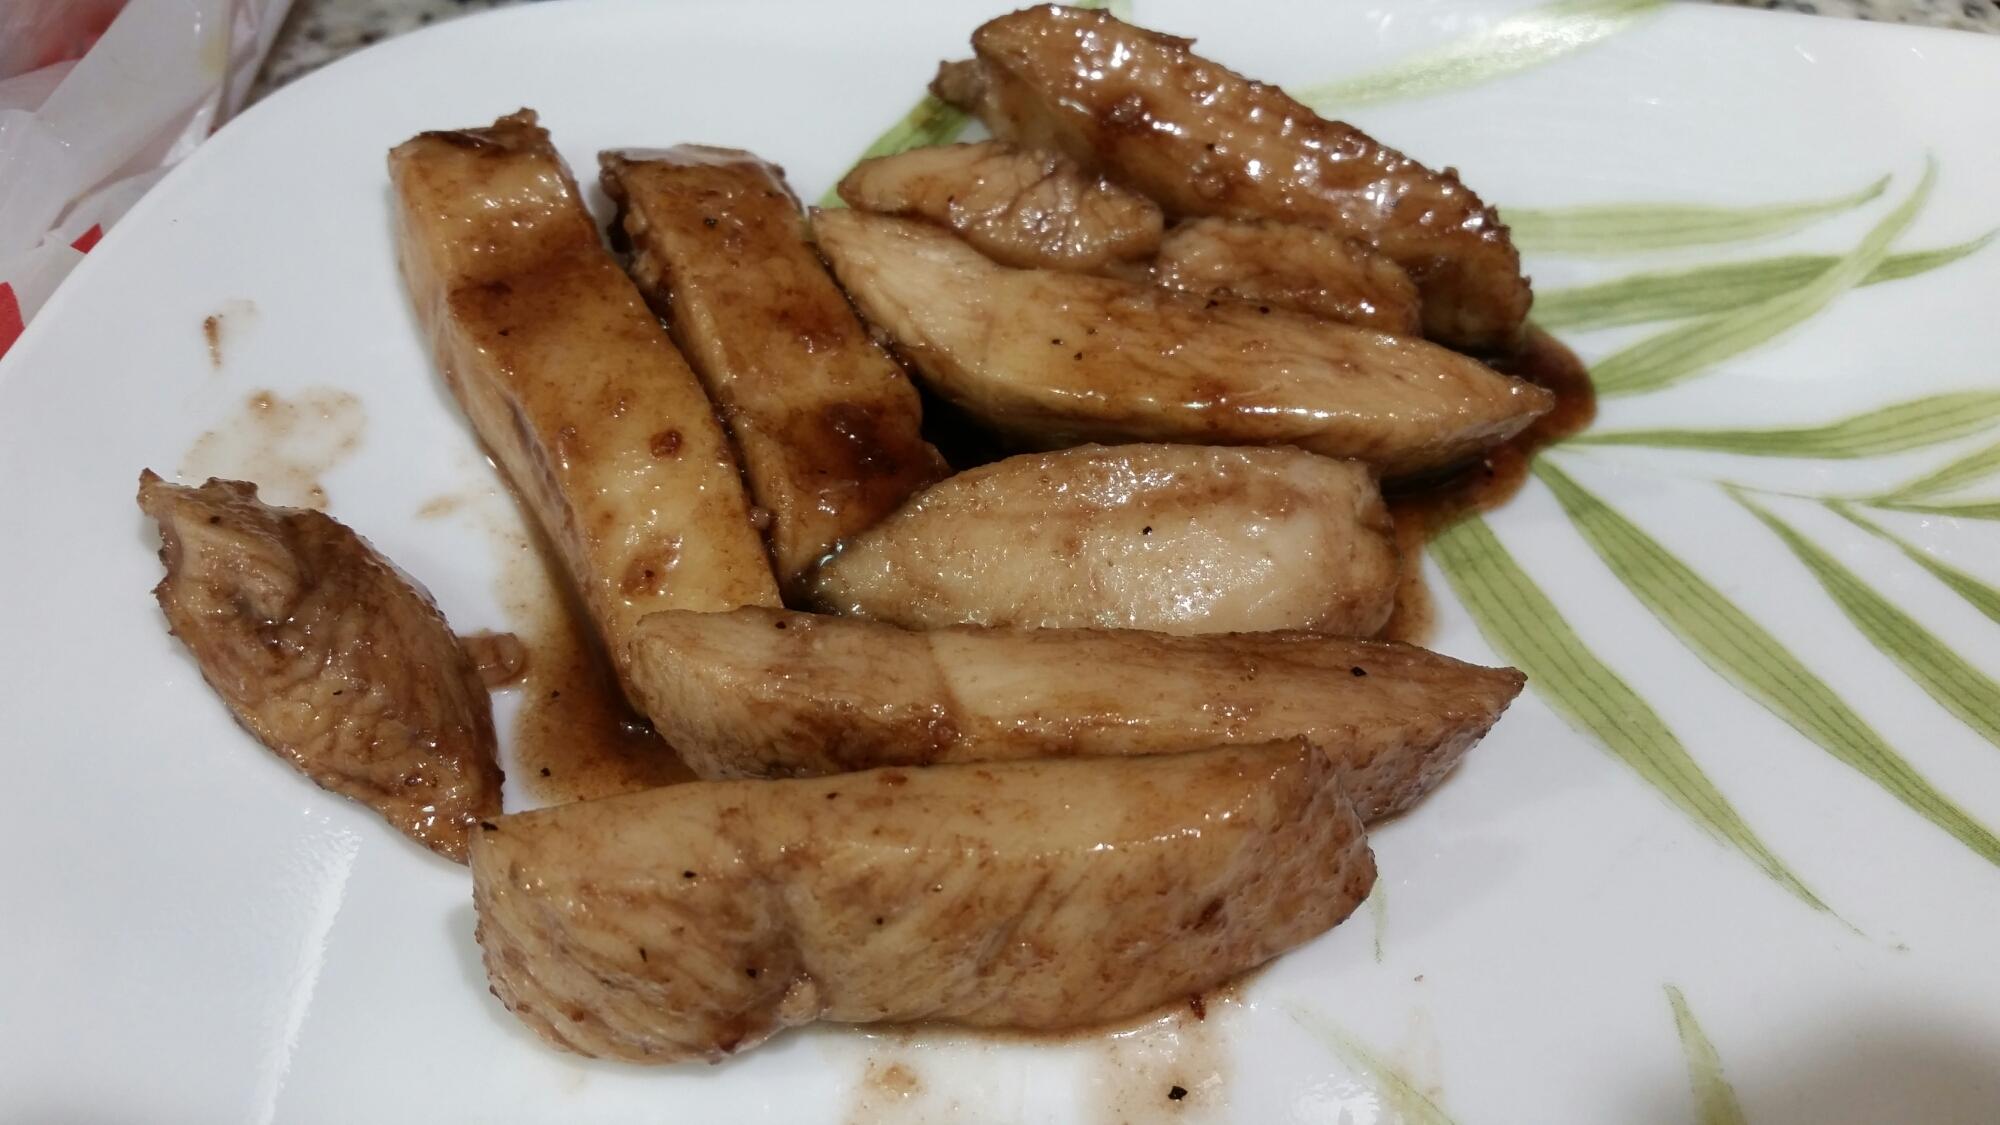 Honey balsamic chicken with glaze.